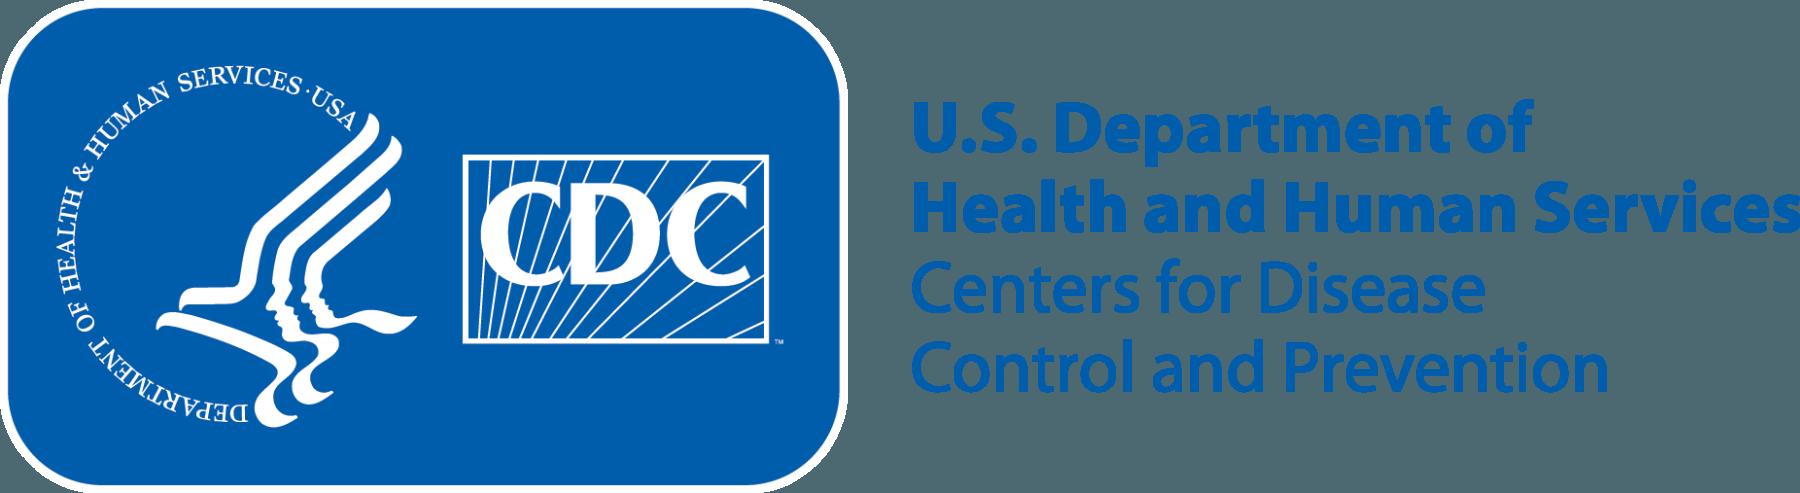 CDC Logo - LogoDix